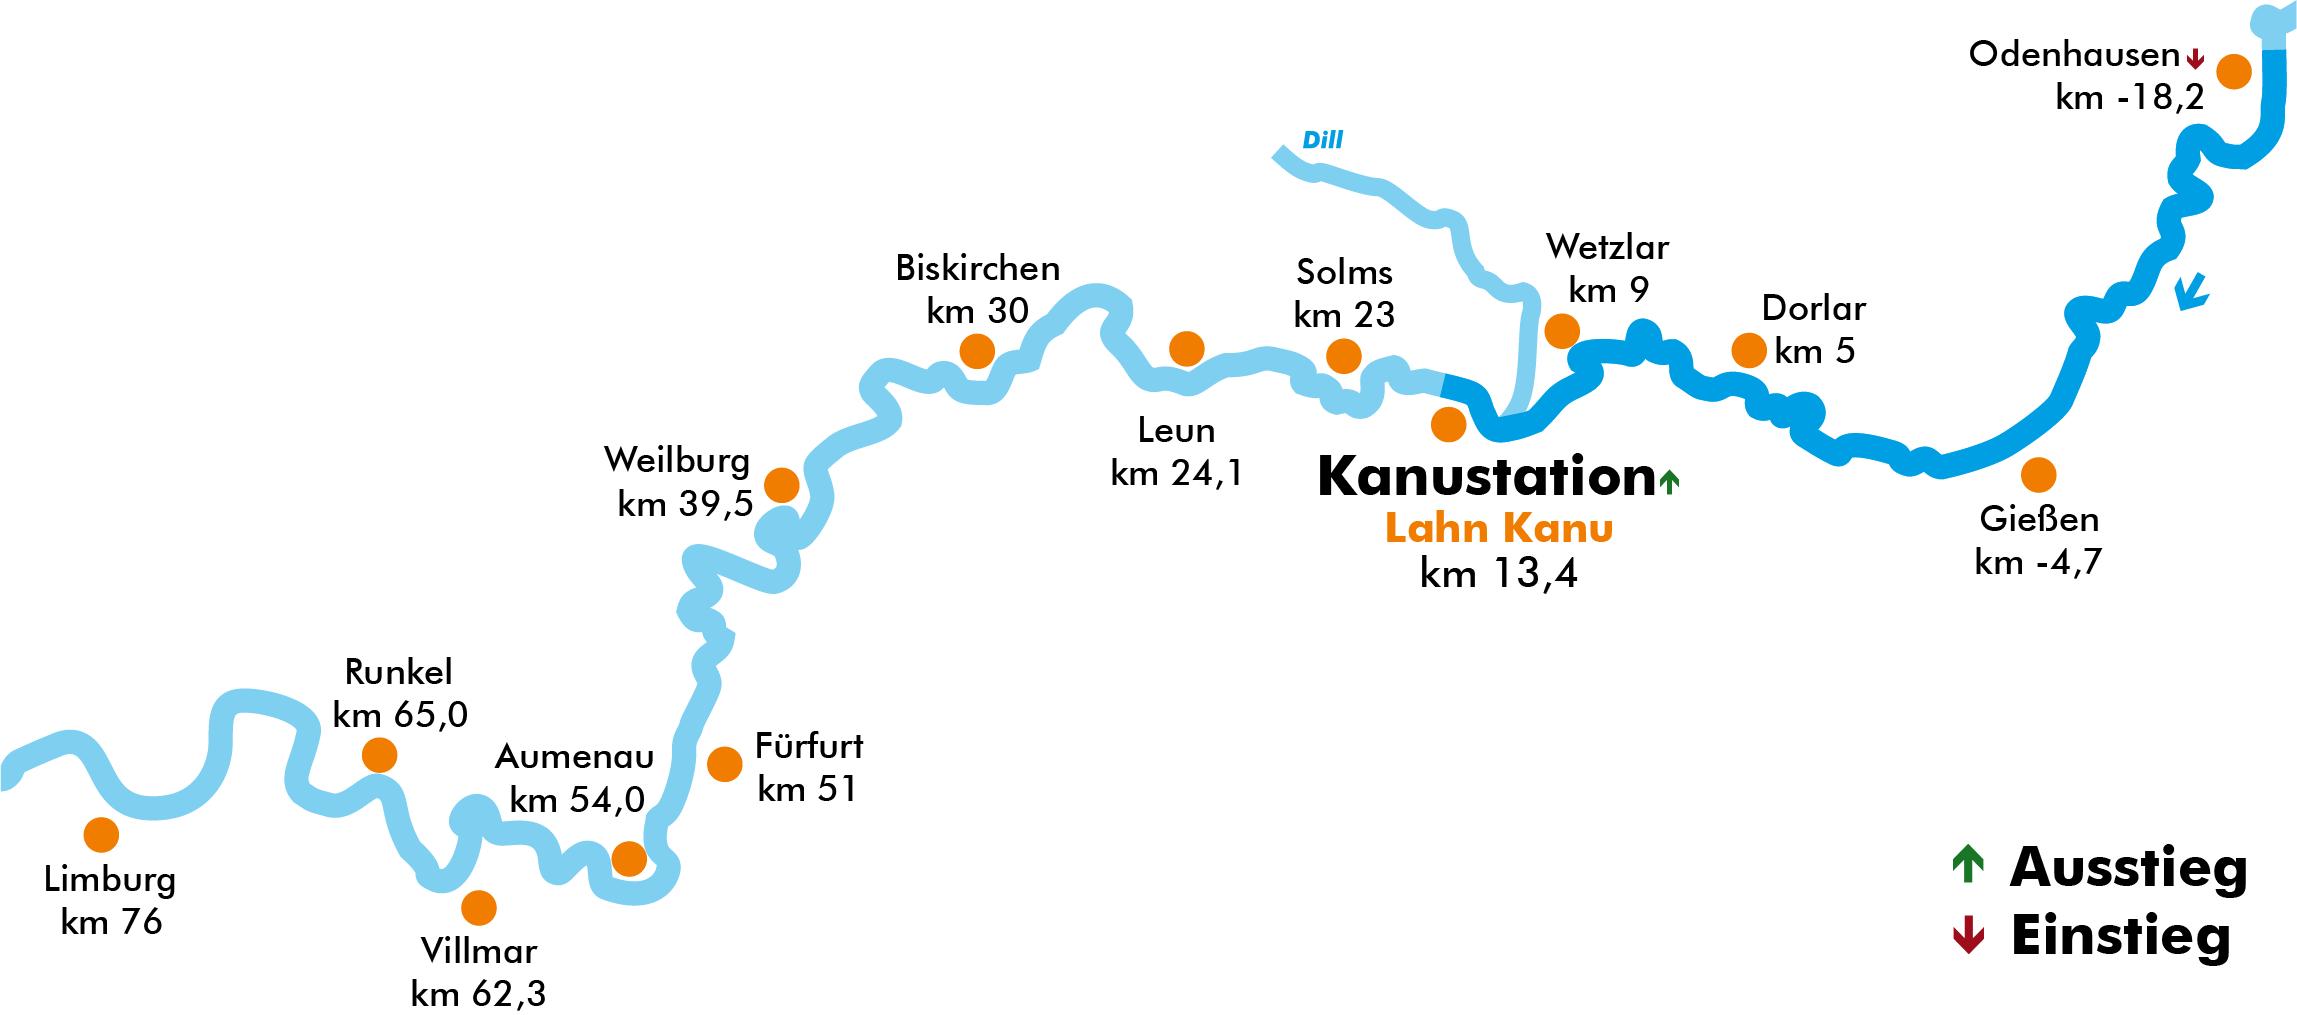 Lahnkarte Odenhausen Wetzlar